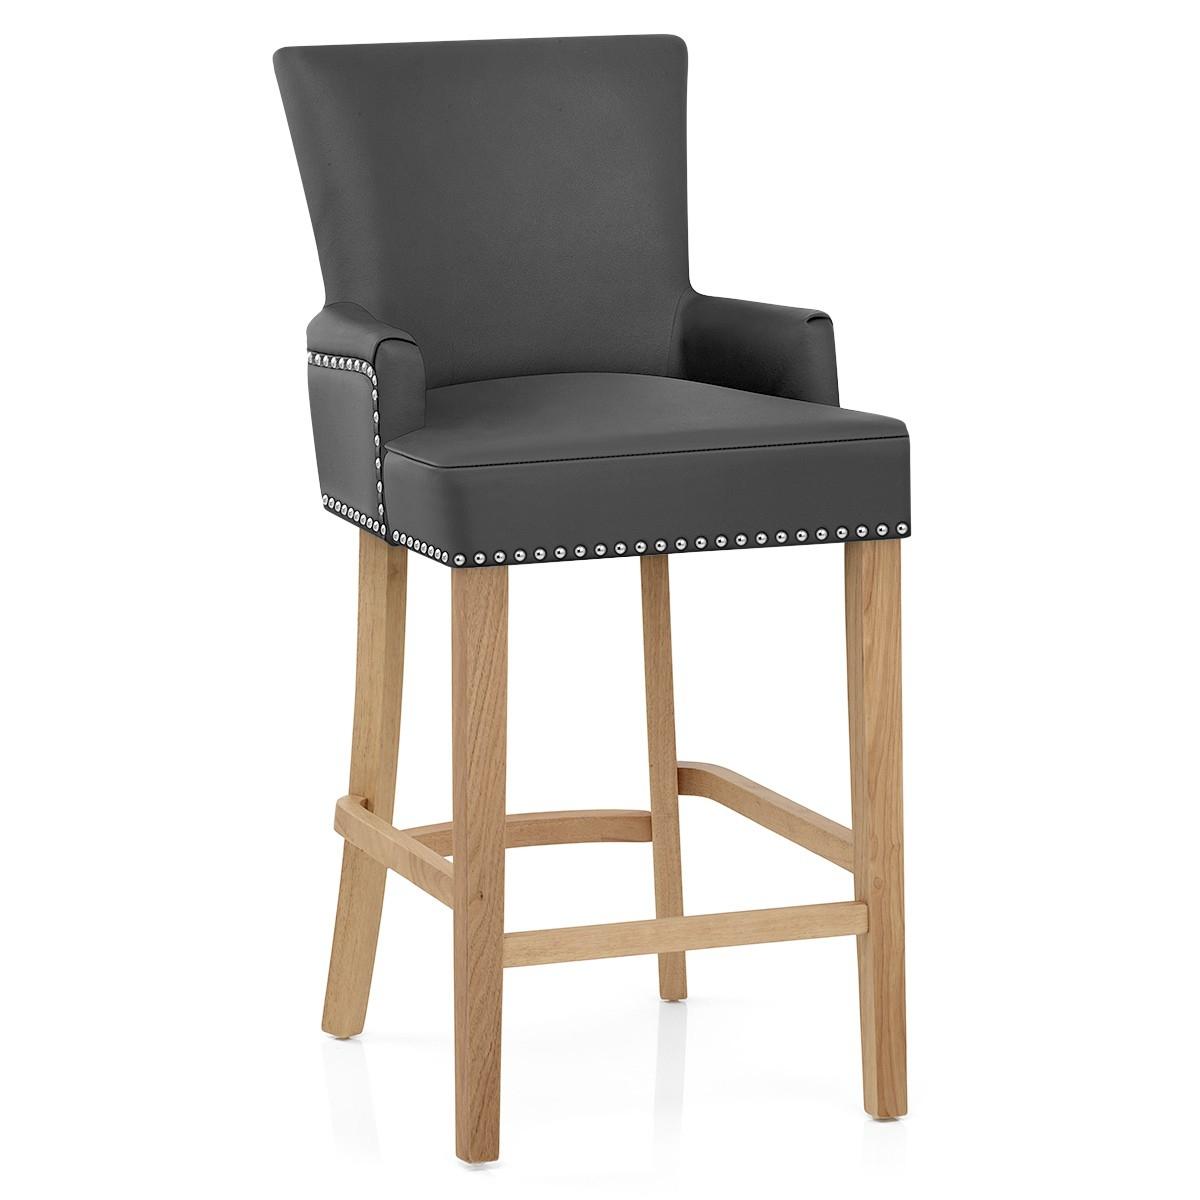 tabouret bar avec dossier trendy tabouret de bar avec accoudoir blanc er kit rglable en hauteur. Black Bedroom Furniture Sets. Home Design Ideas